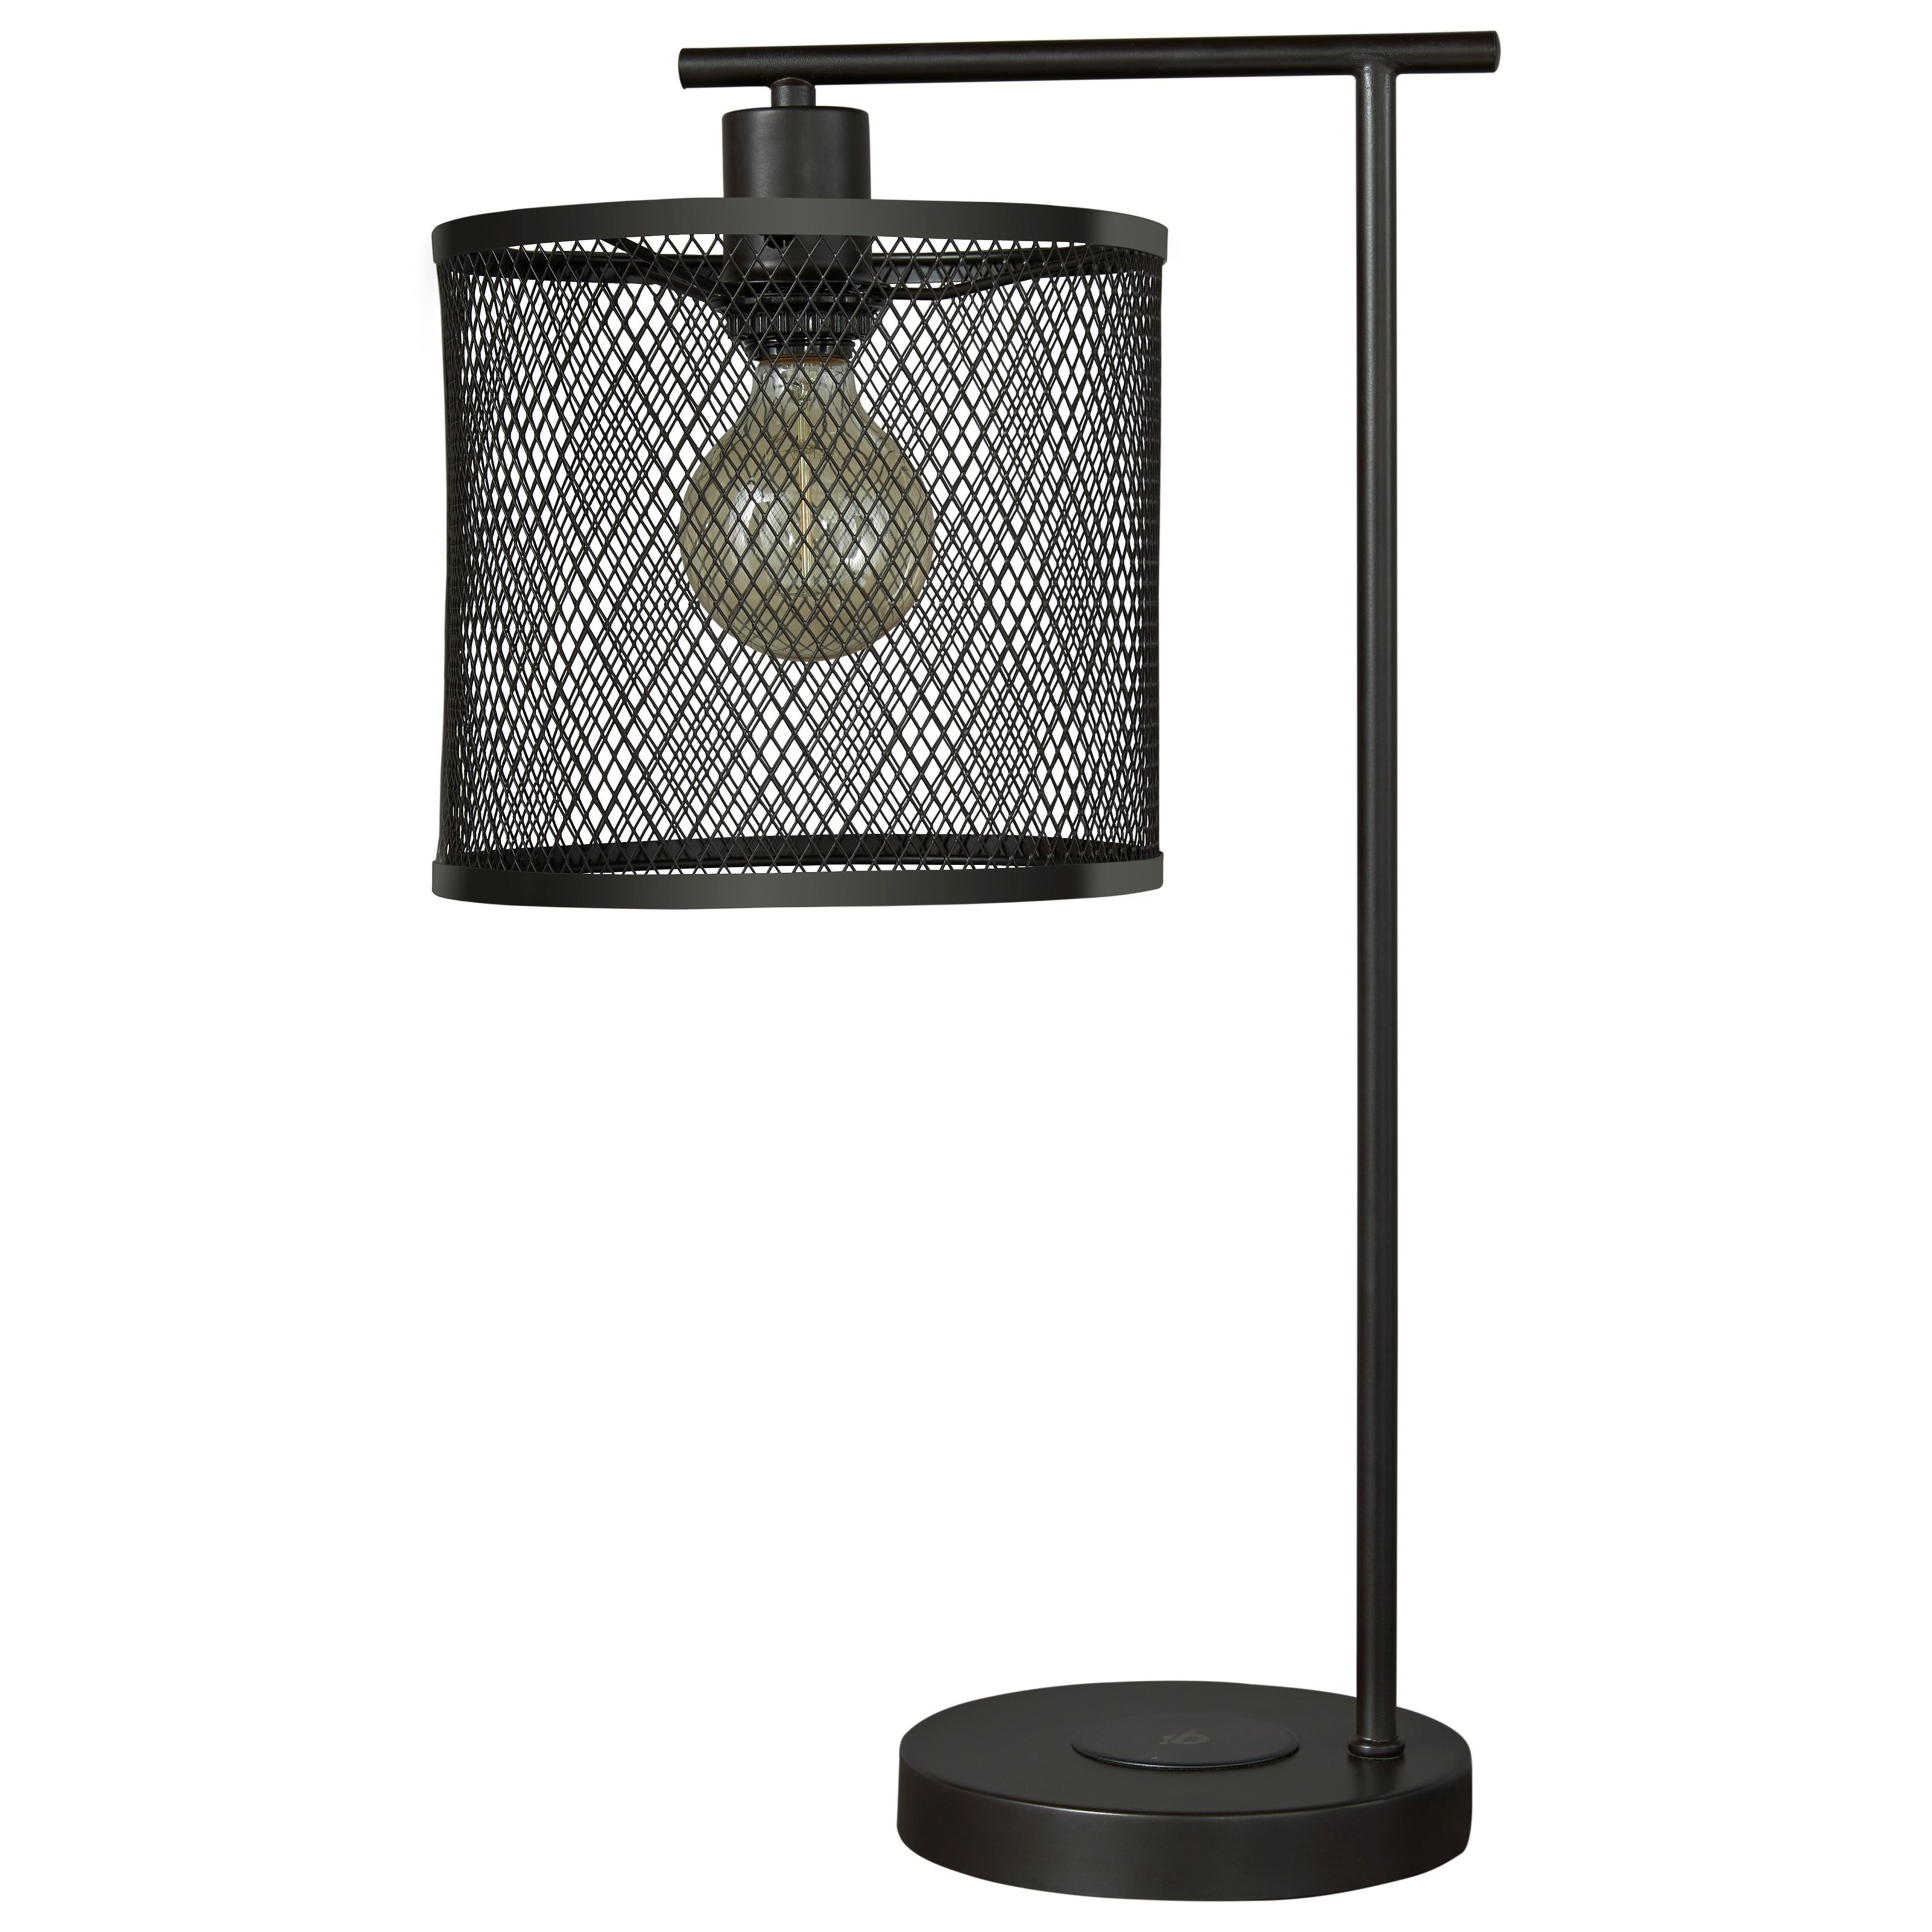 Lamps - Casual Nolden Bronze Finish Metal Desk Lamp by Signature at Walker's Furniture